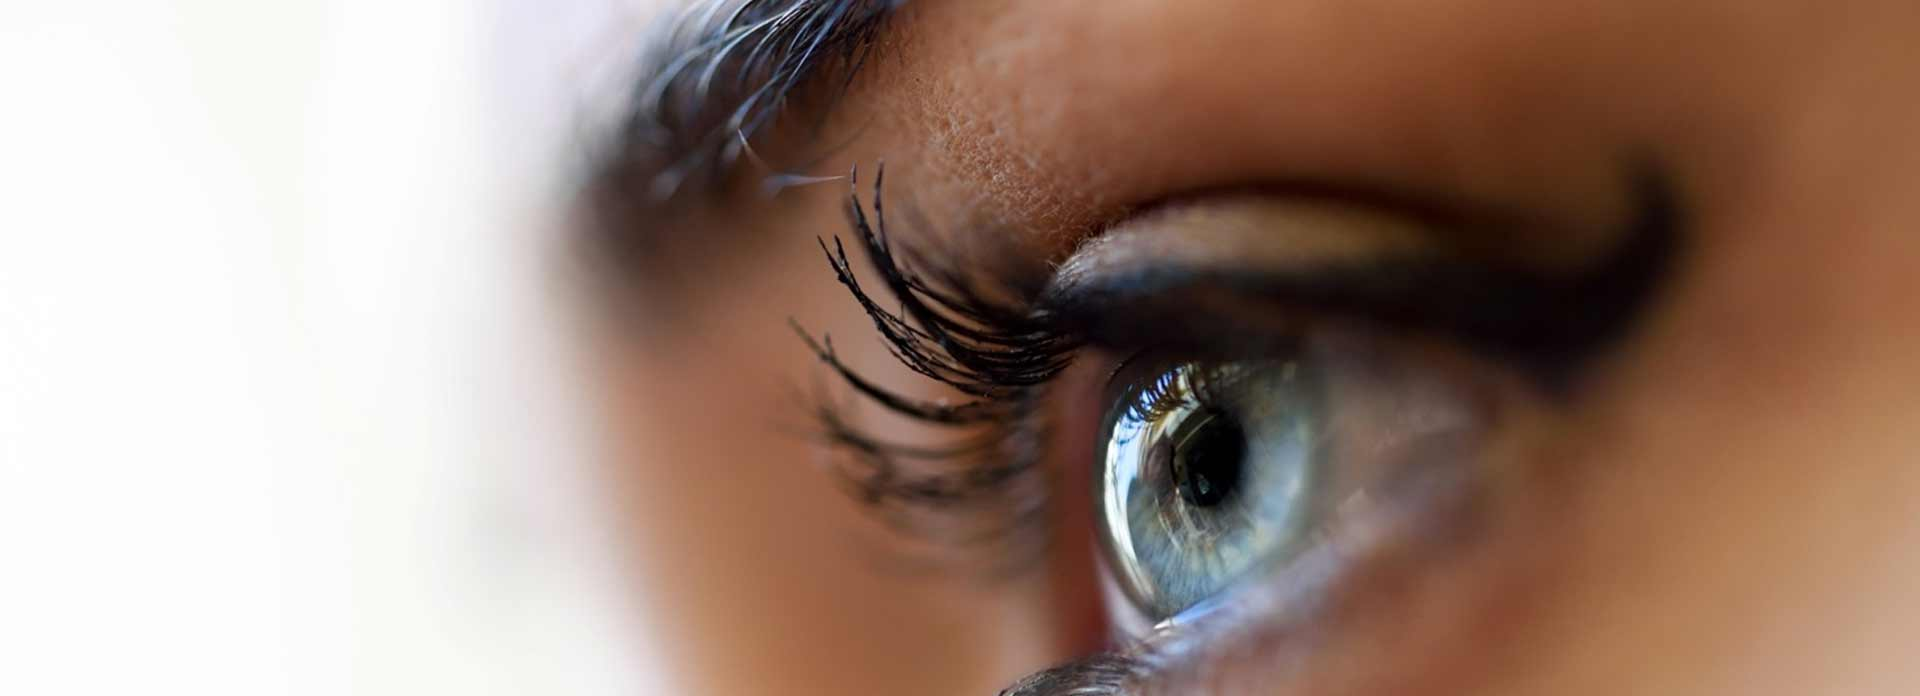 Salon Top in Flair/Cluster eyelash extensions high street Kensington